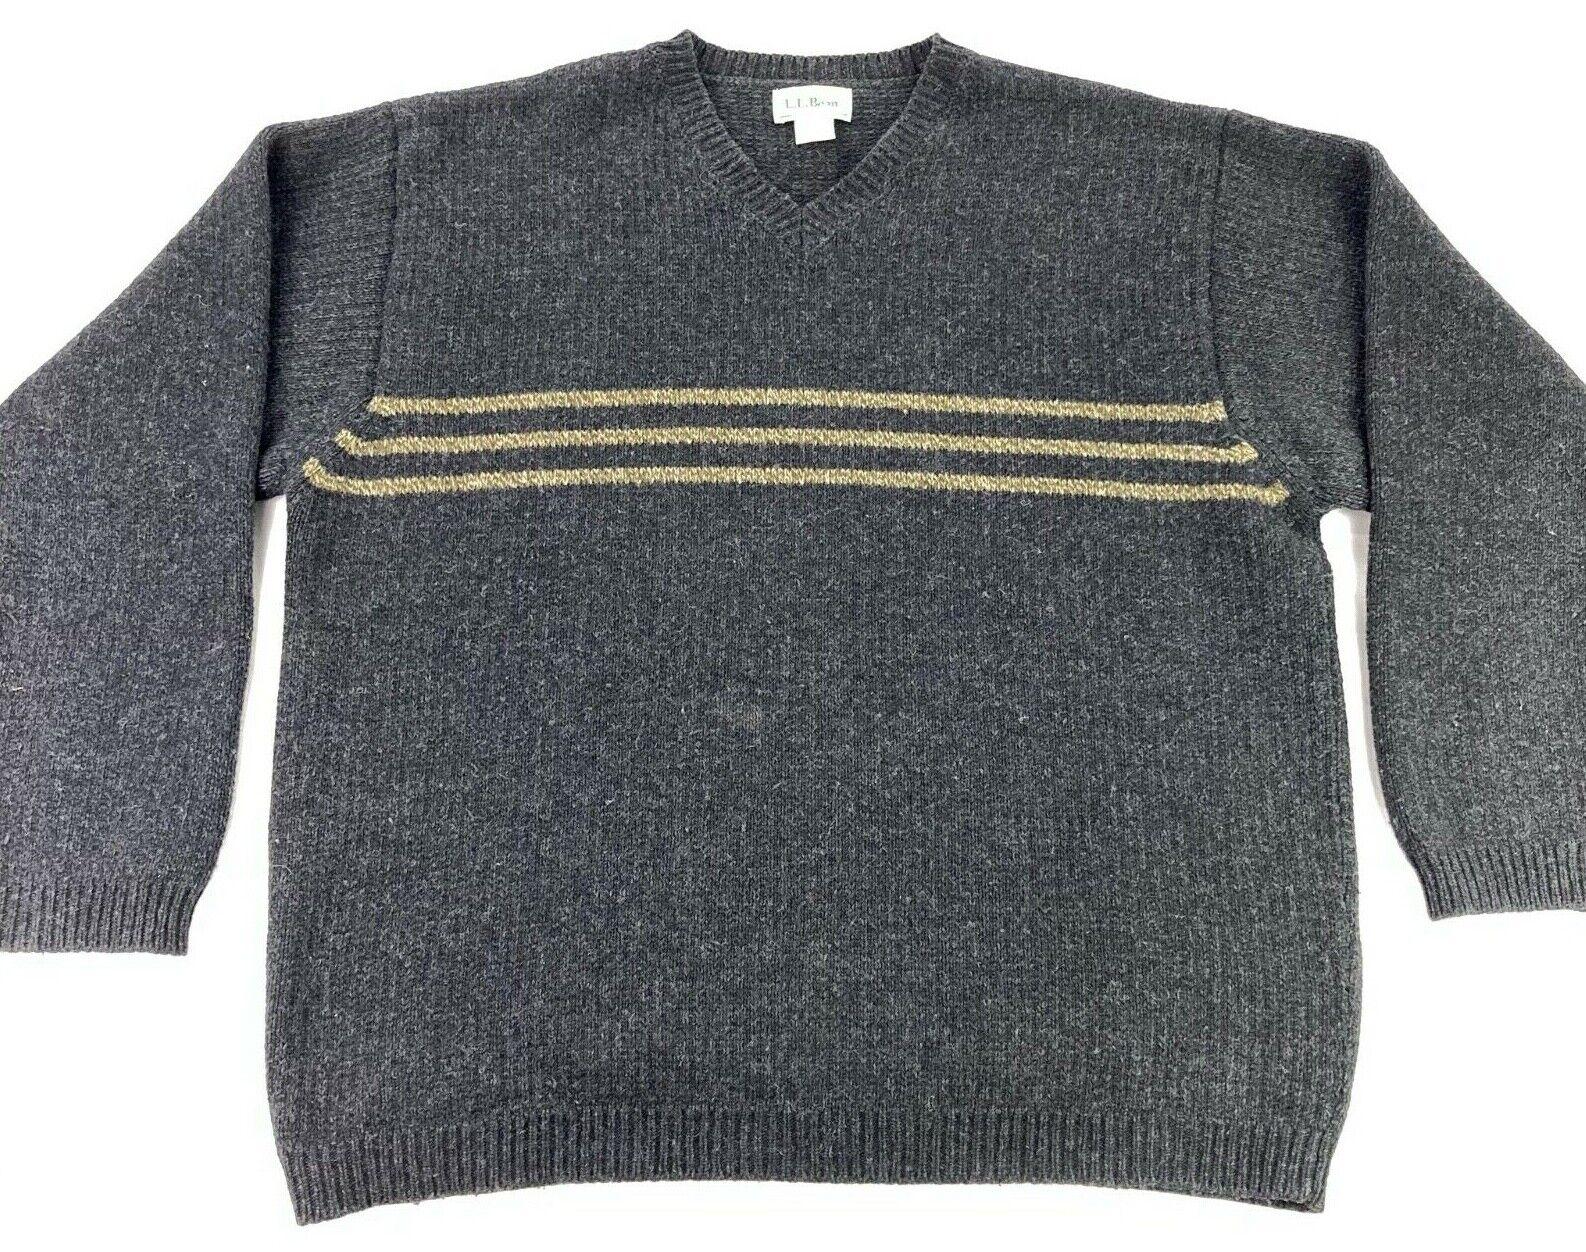 LL Bean Men's Wool V-Neck Sweater Gray • Large - image 2